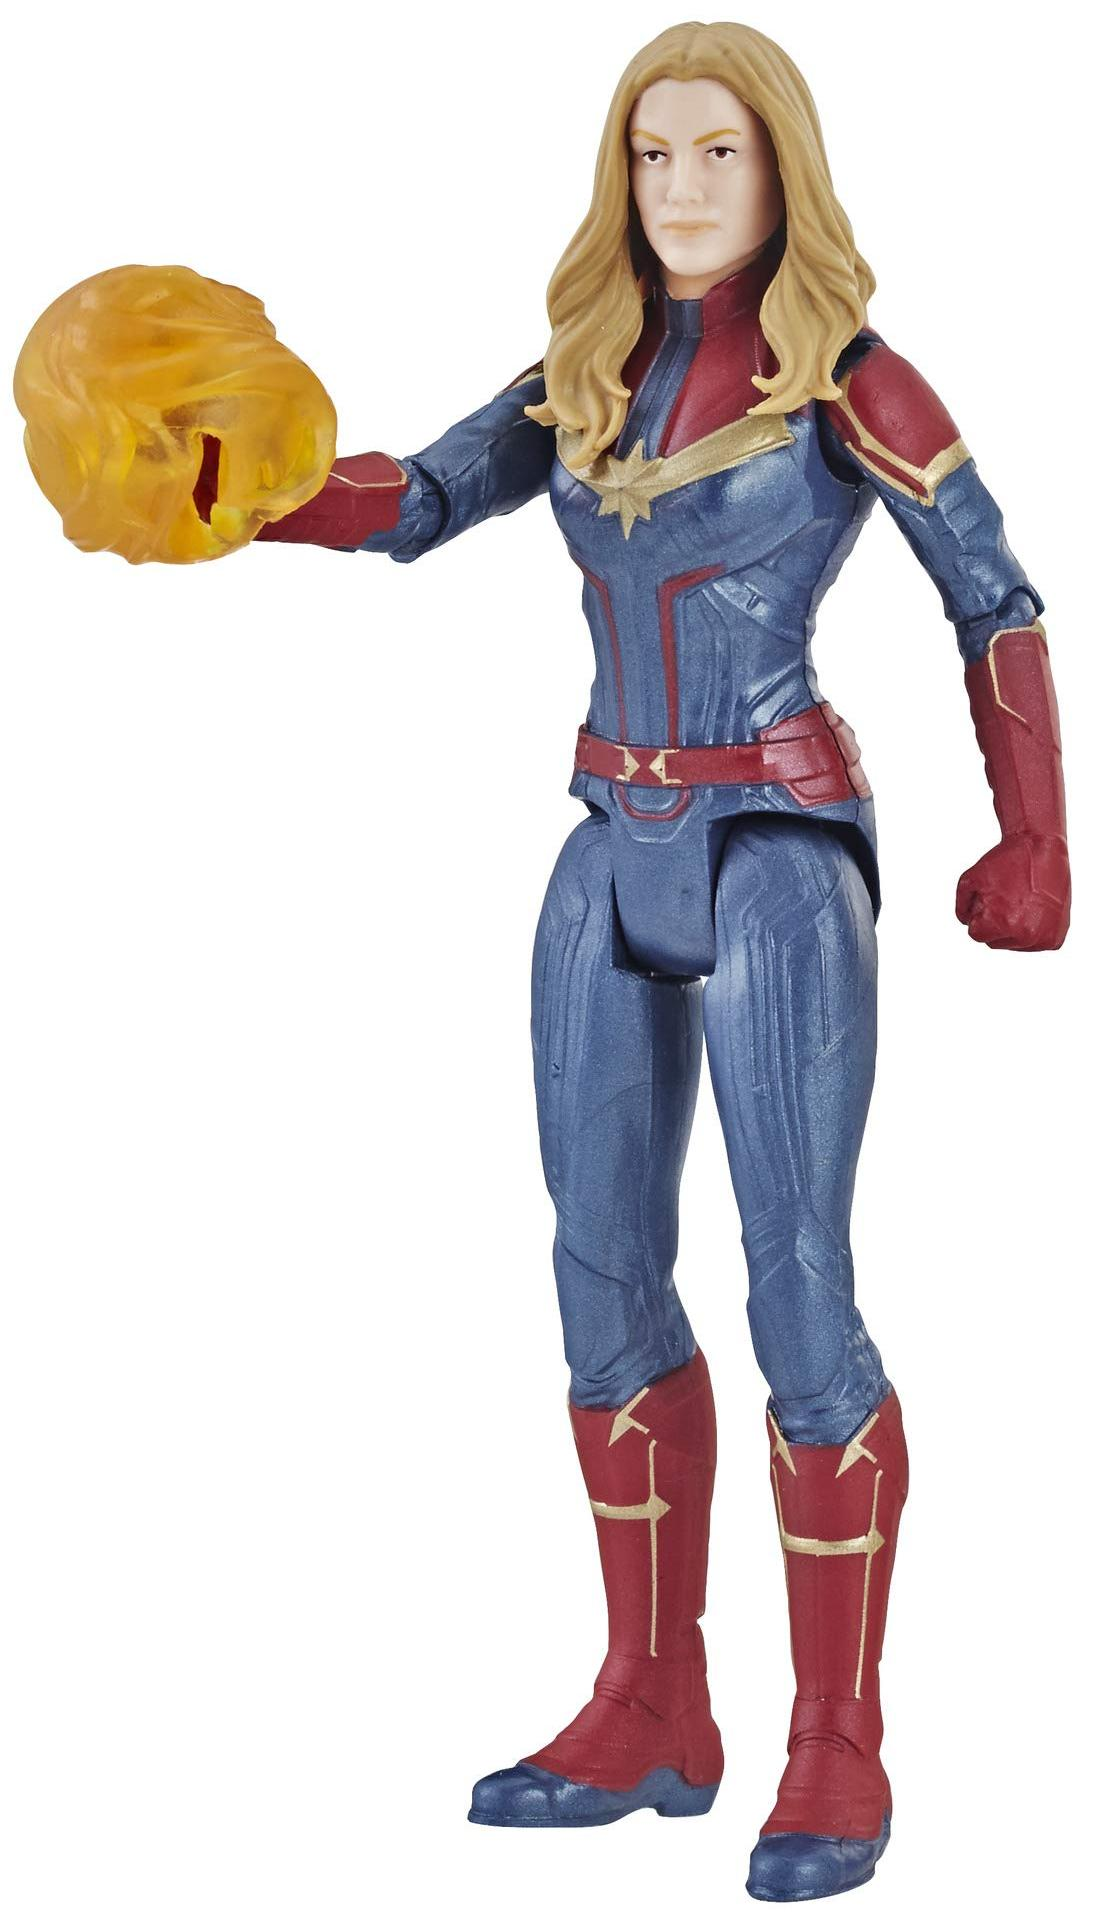 Фигурка Marvel AVENGERS Мстители - Капитан Марвел 15 см - из фильма